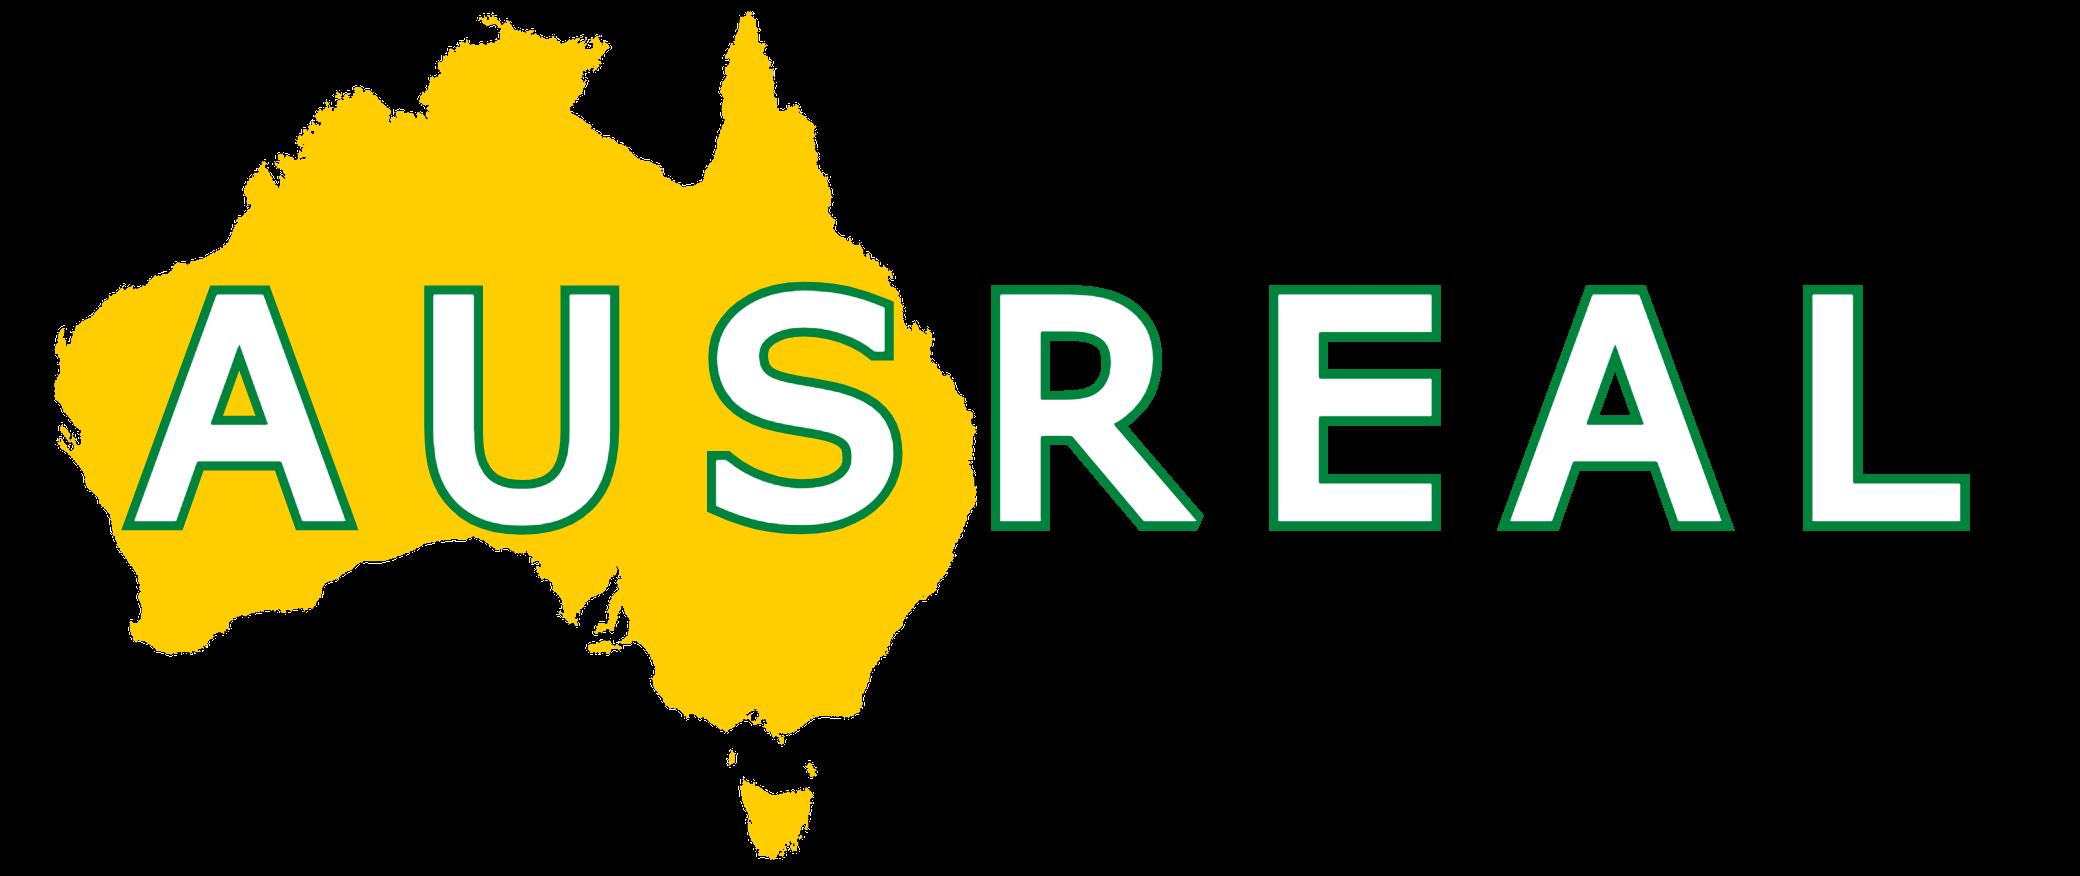 AUSTRALIAN PEOPLE'S GOVERNANCE